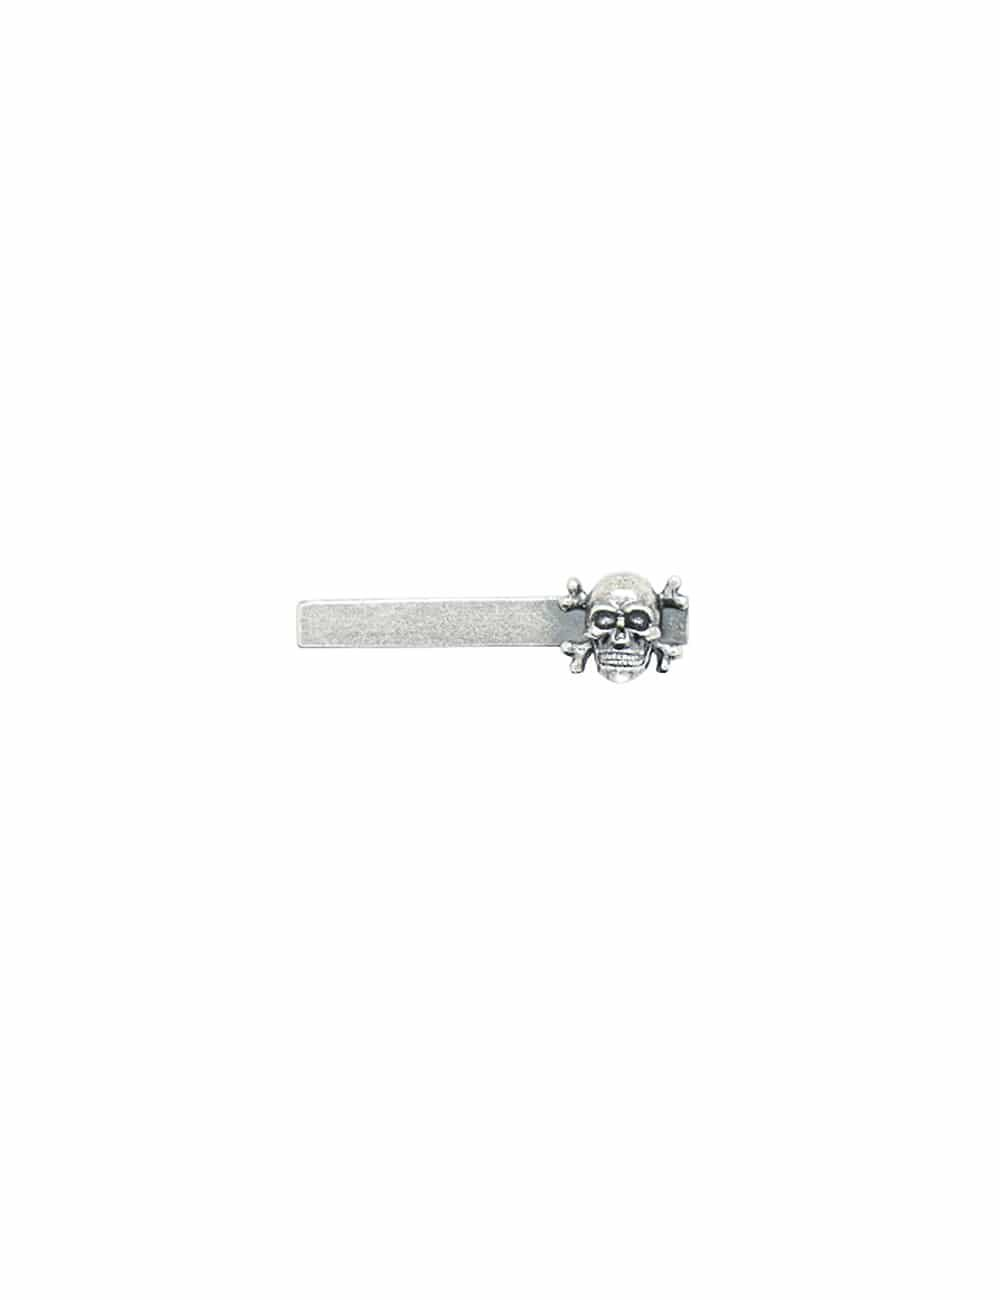 Antique Silver Skulls Tie Clip T231NF-013B